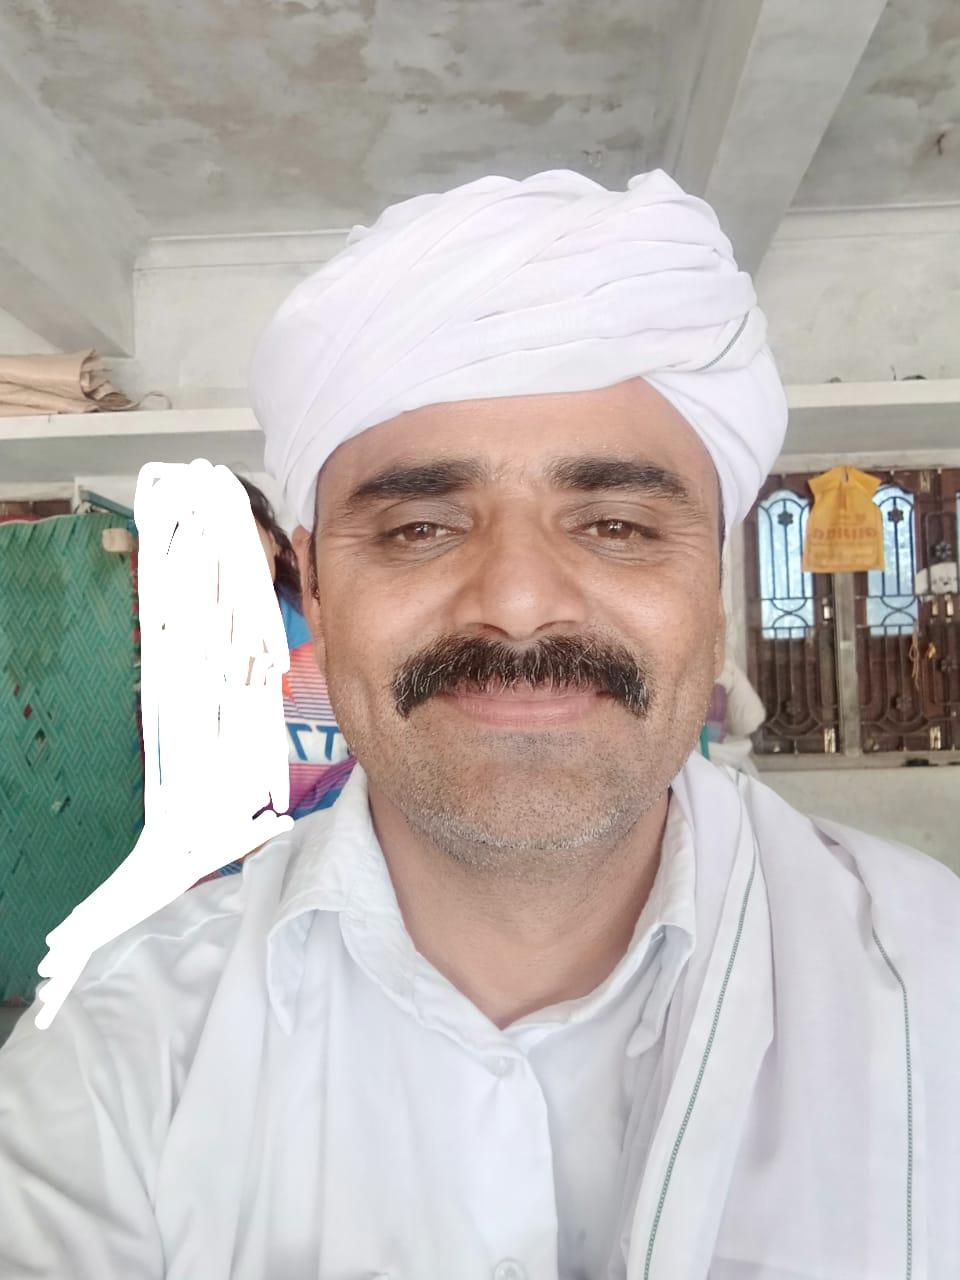 Bhemabhai Chaudhri